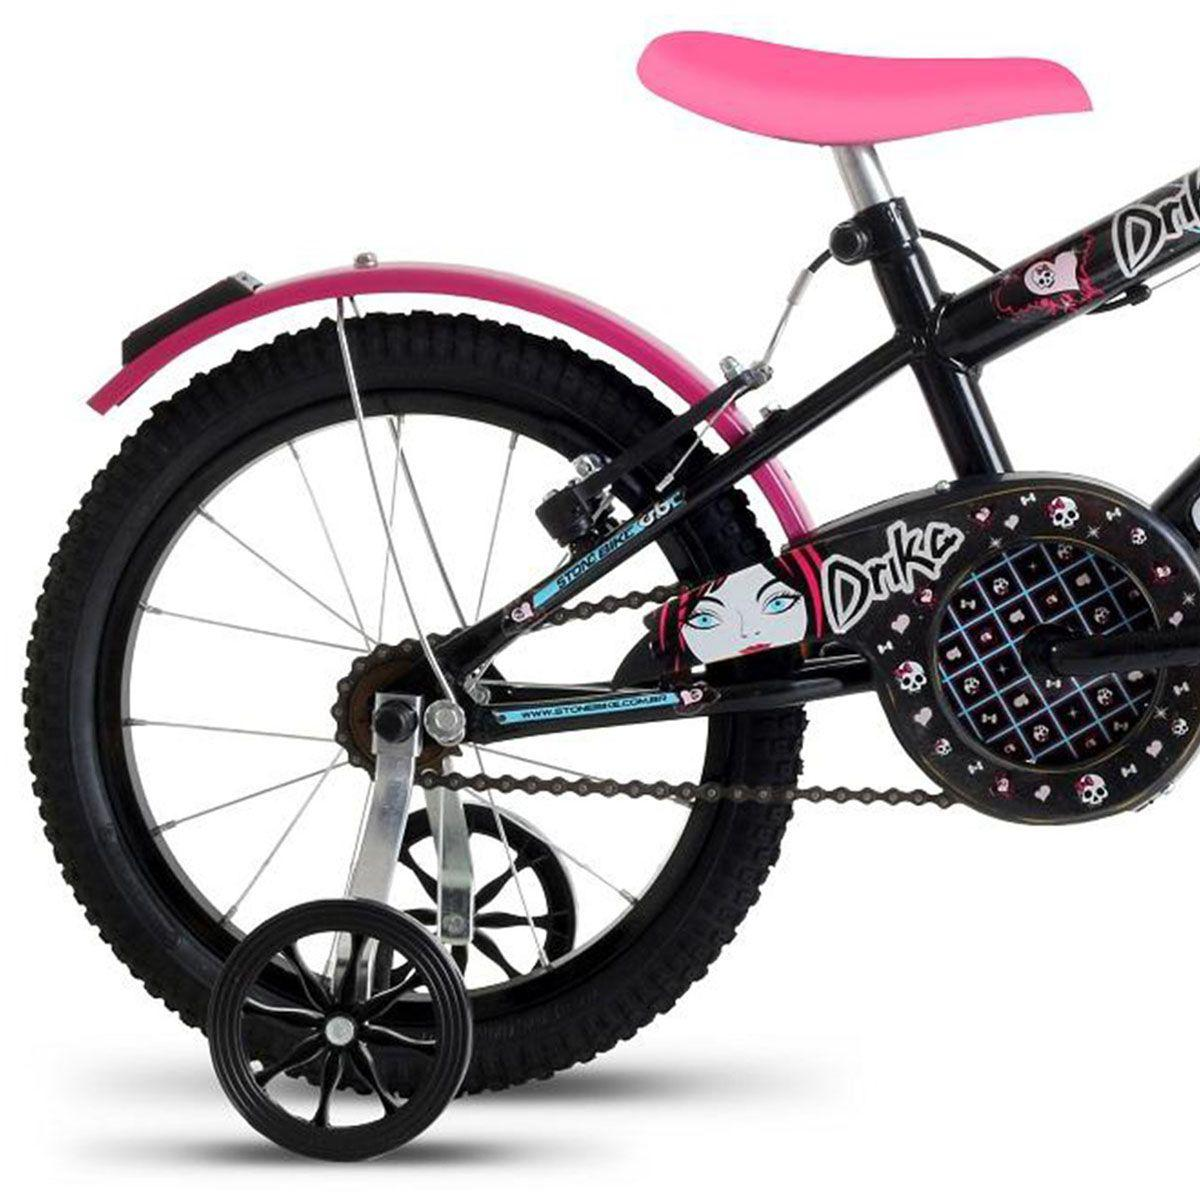 1643d8aa6 Bicicleta Infantil Feminina Drika Aro 16 Stone Bike - Stone bikes Produto  não disponível